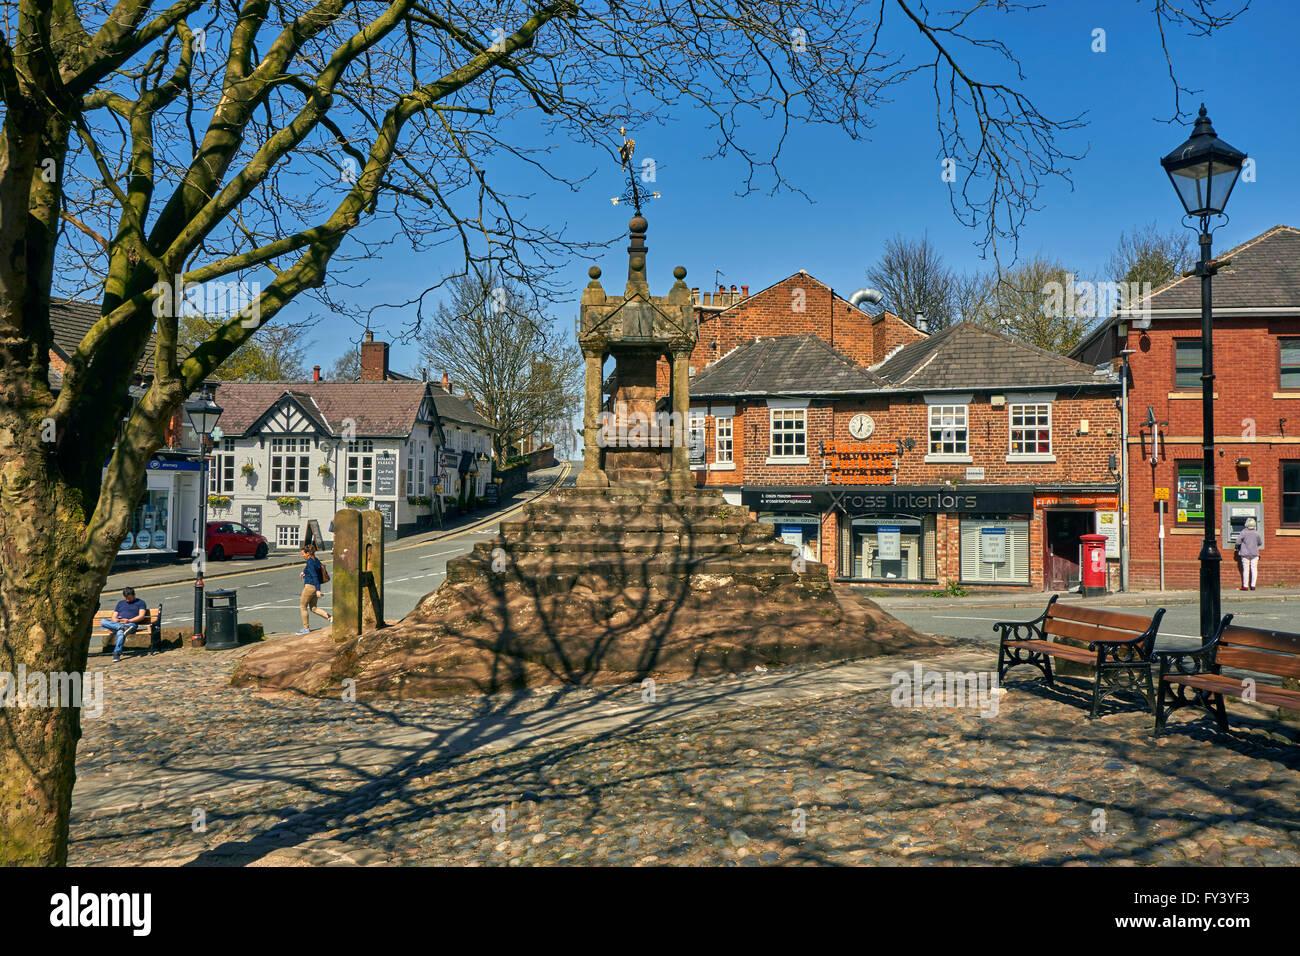 Lymm Cross at Lymm Village, Warrington, Cheshire. - Stock Image